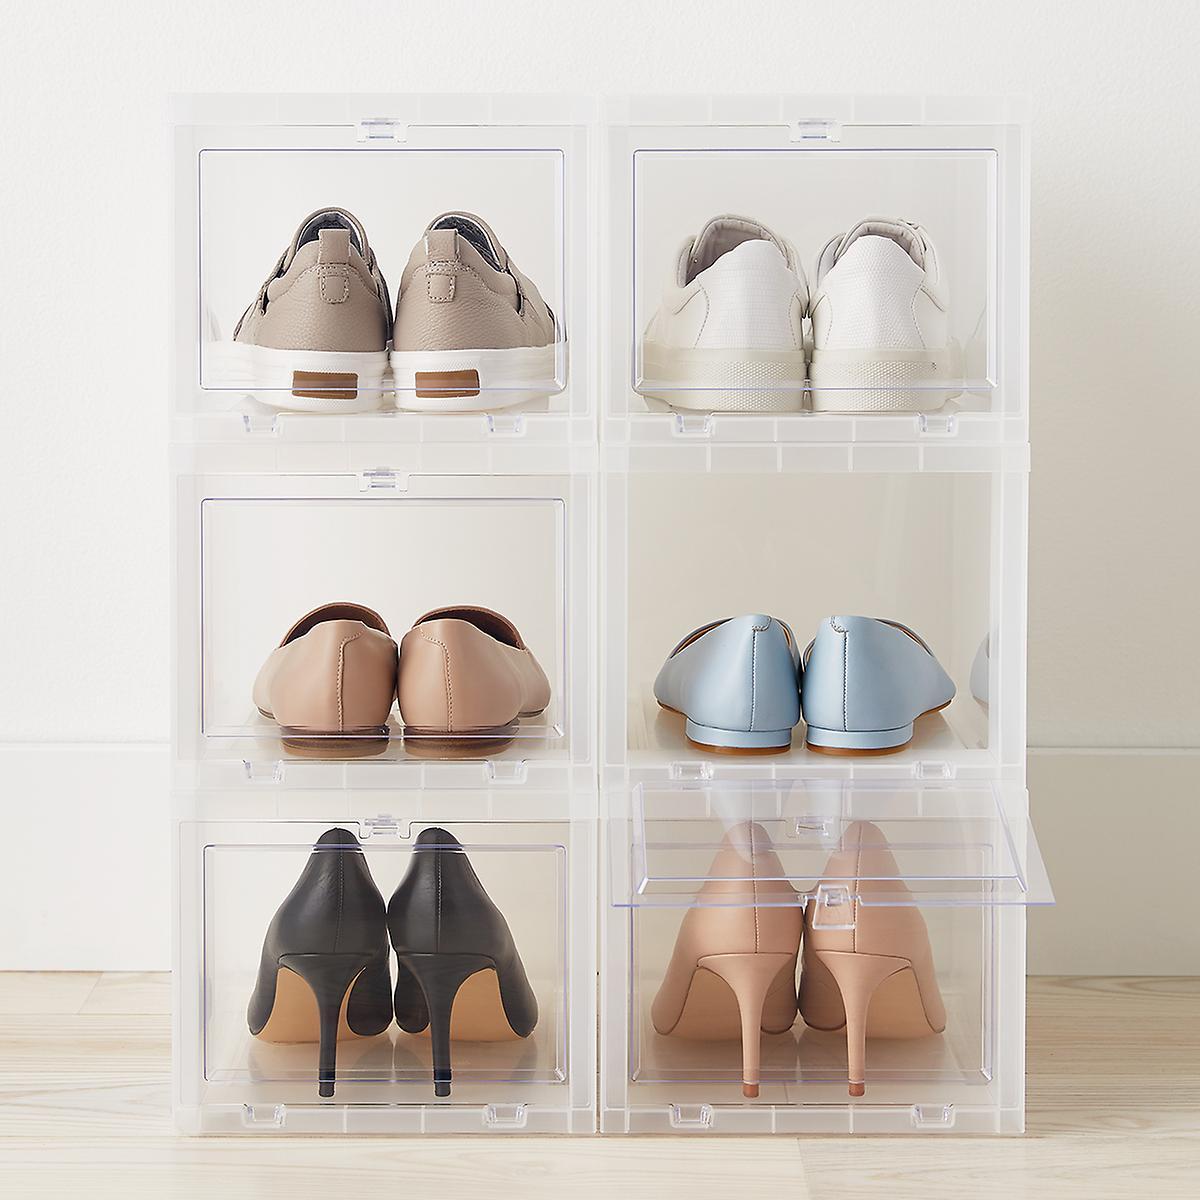 Bedroom organizers stackable shoe storage boxes